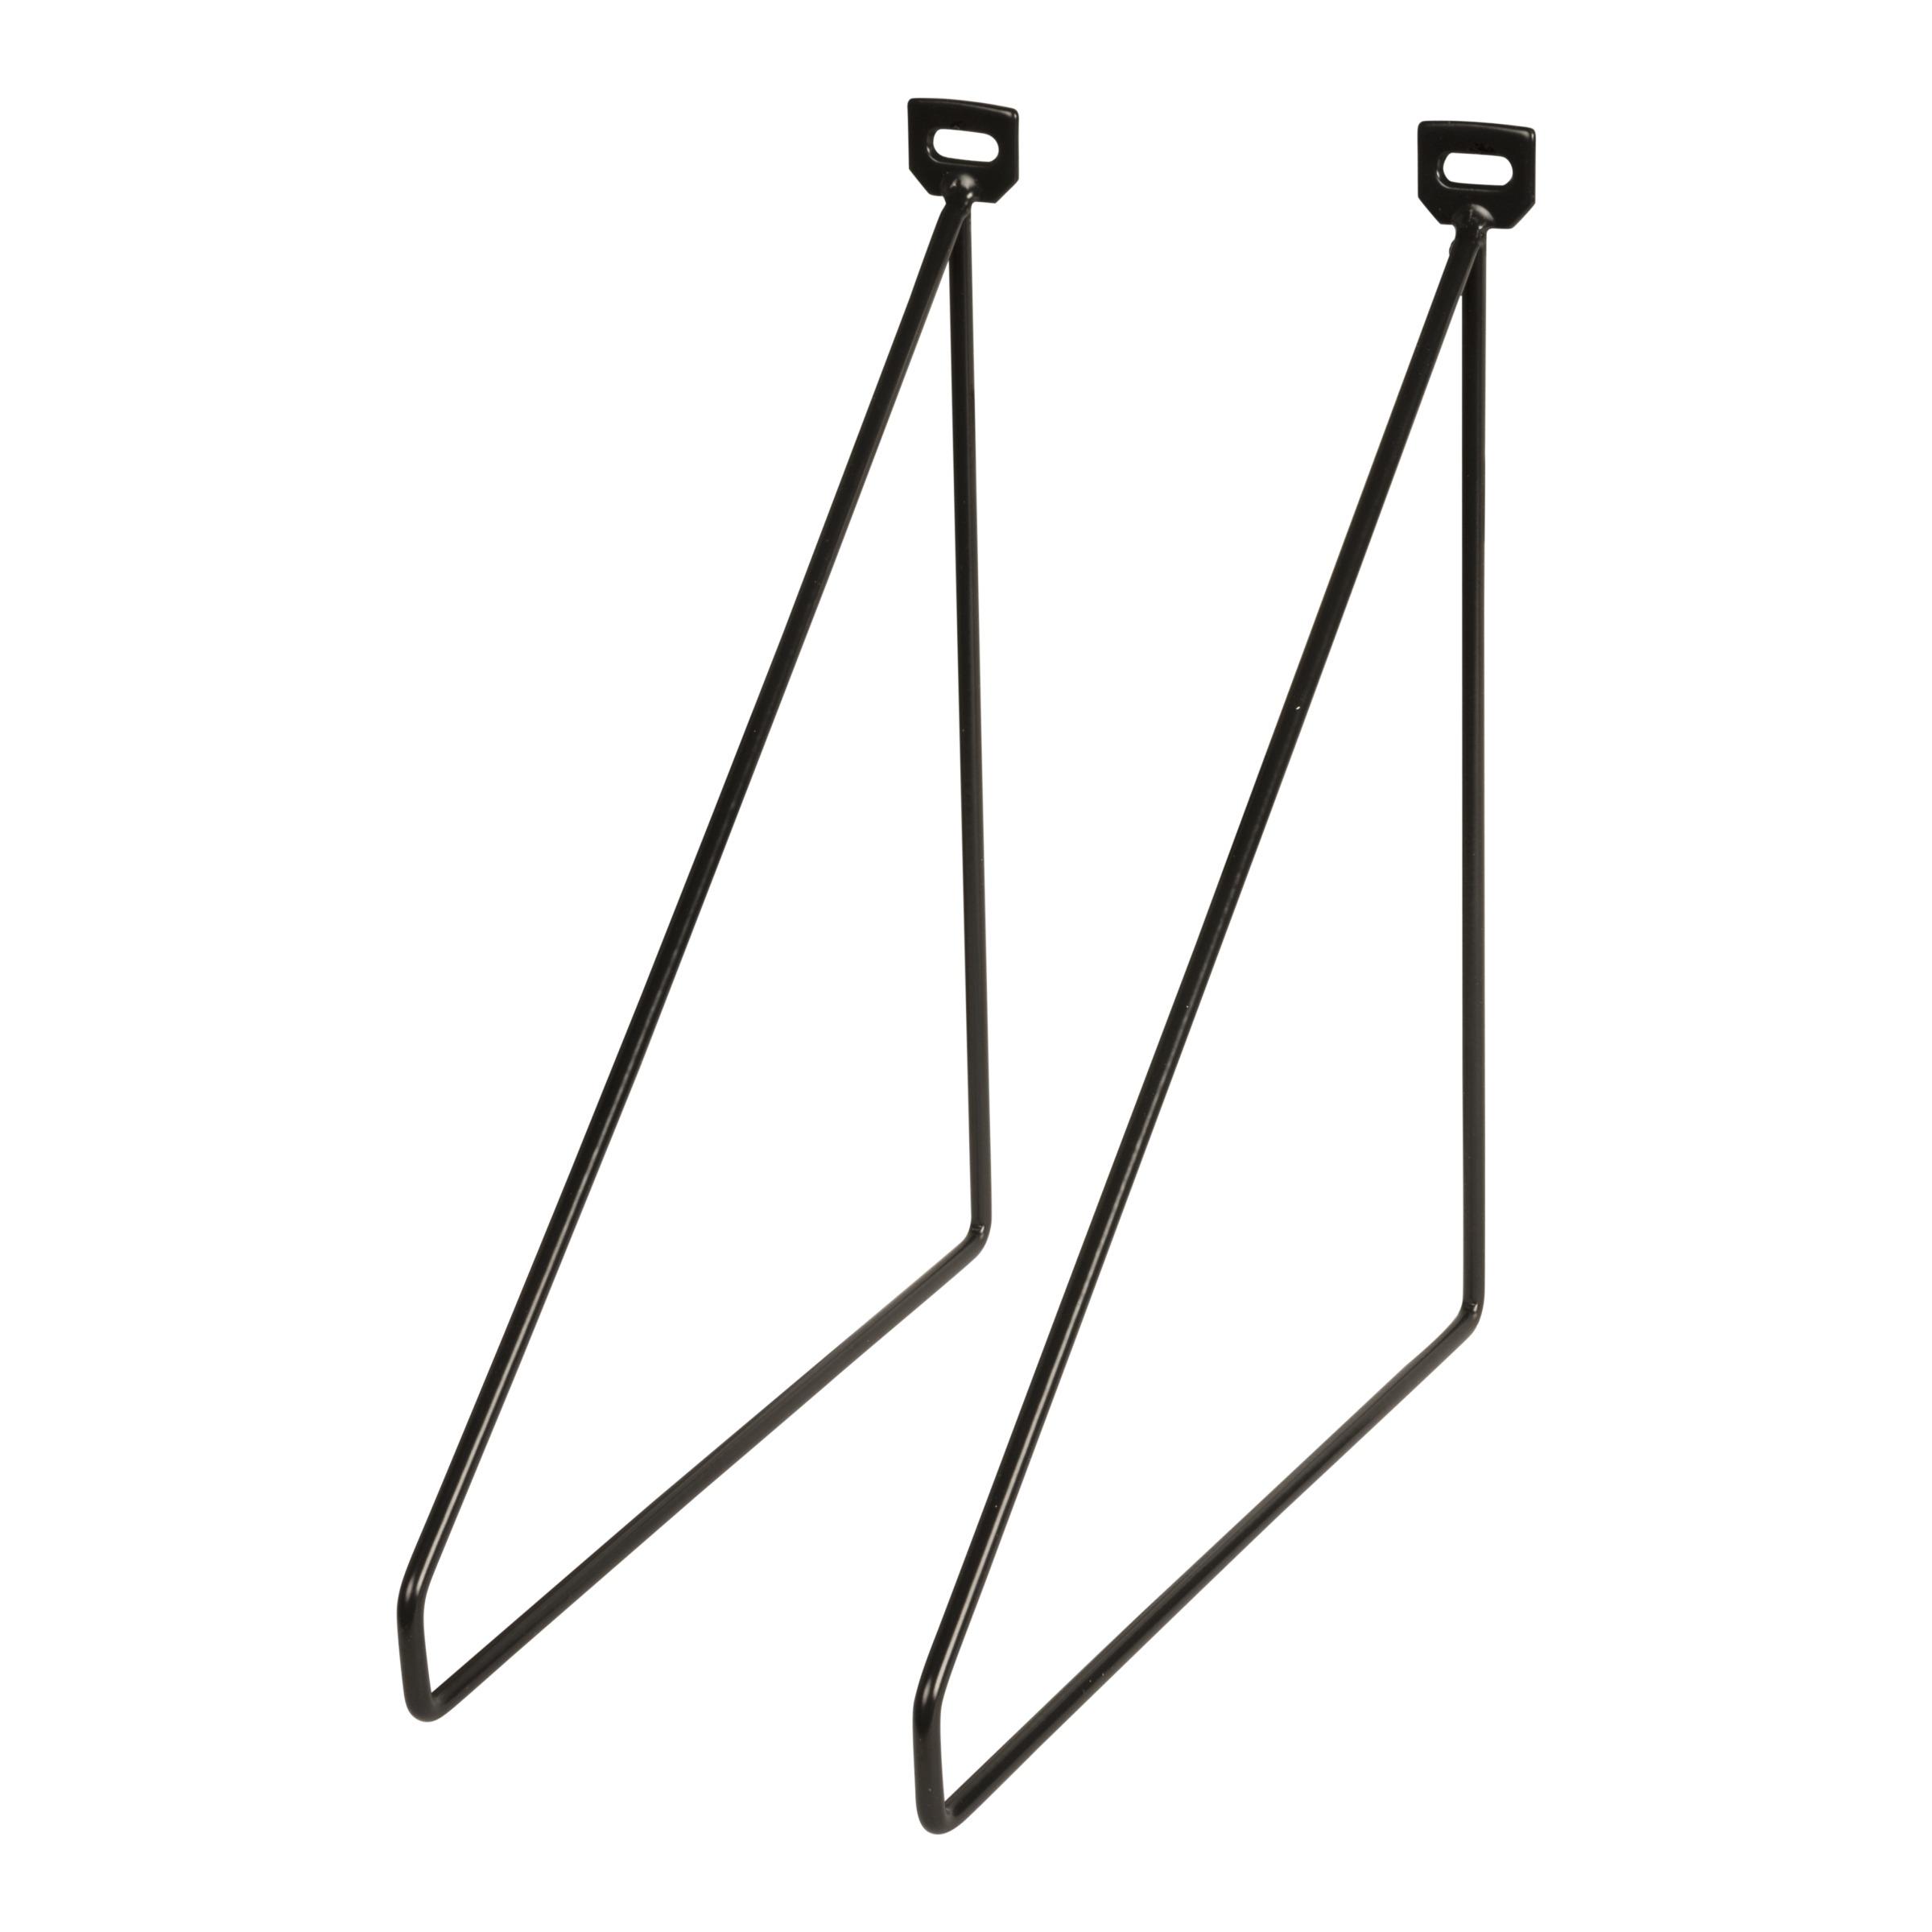 Duraline Wandplank Karwei.Duraline Plankdrager Metaal Zwart 2 Stuks Kitchen Wardrobe Rack